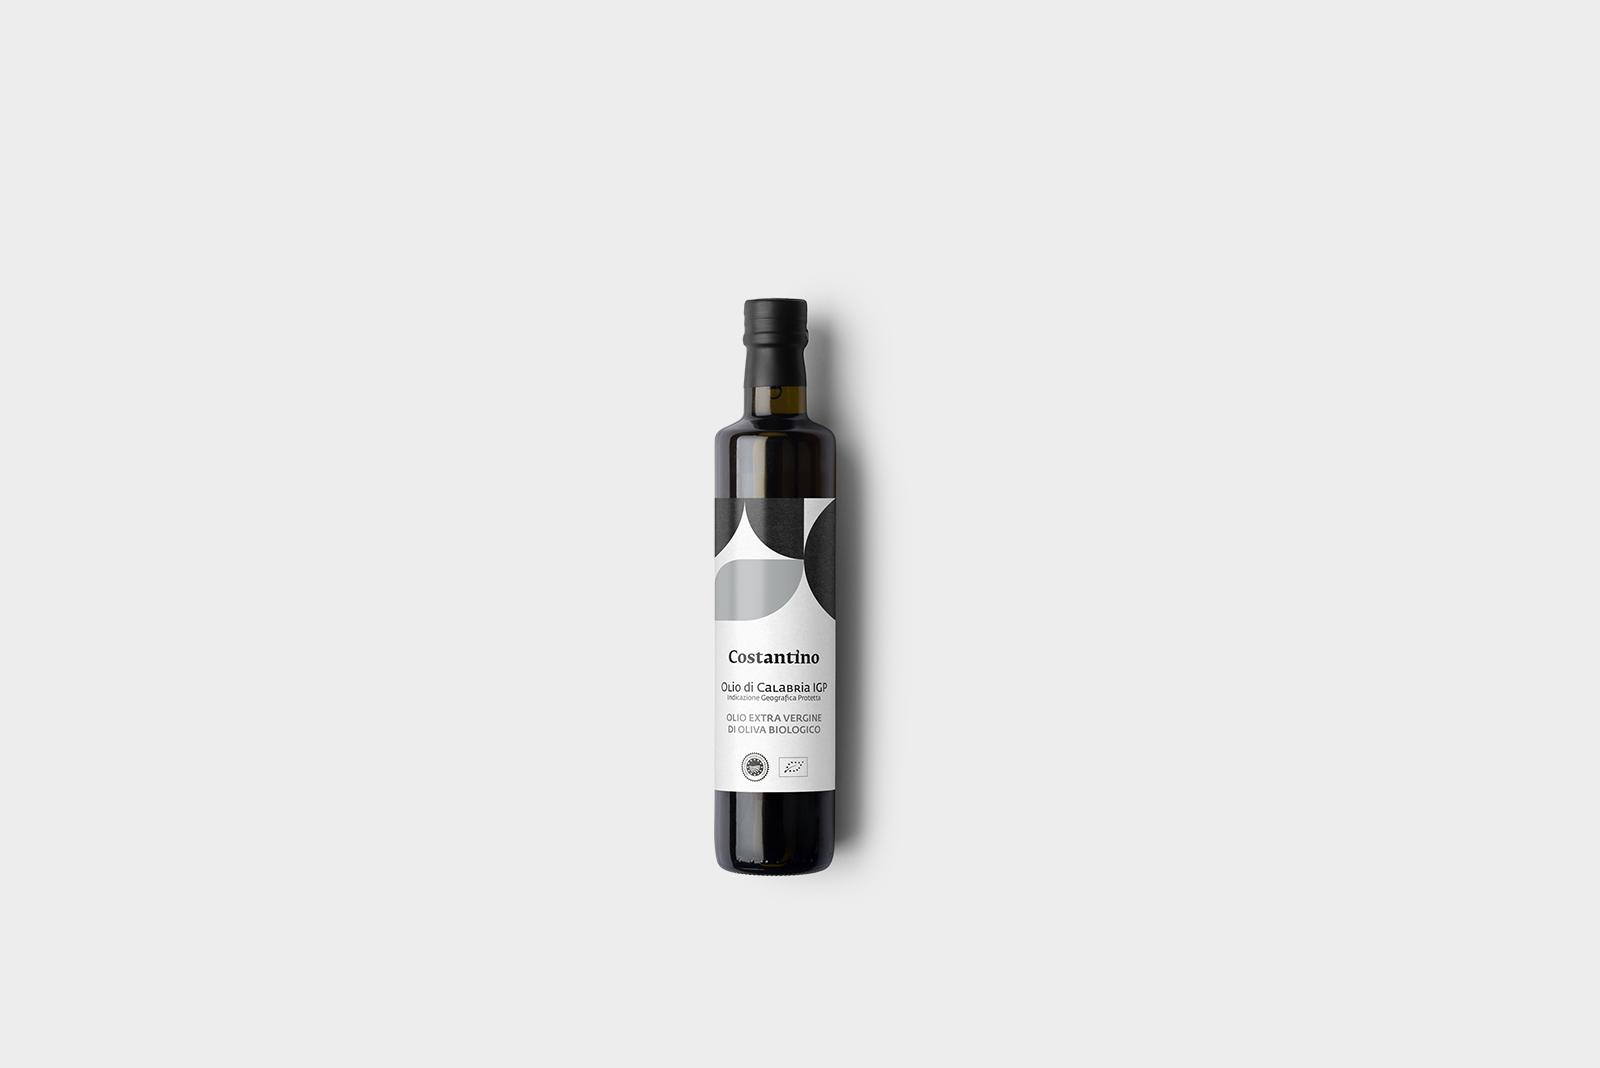 Costantino - Olio Extra Vergine d'Oliva Biologico IGP Calabria - bottiglia 10cl